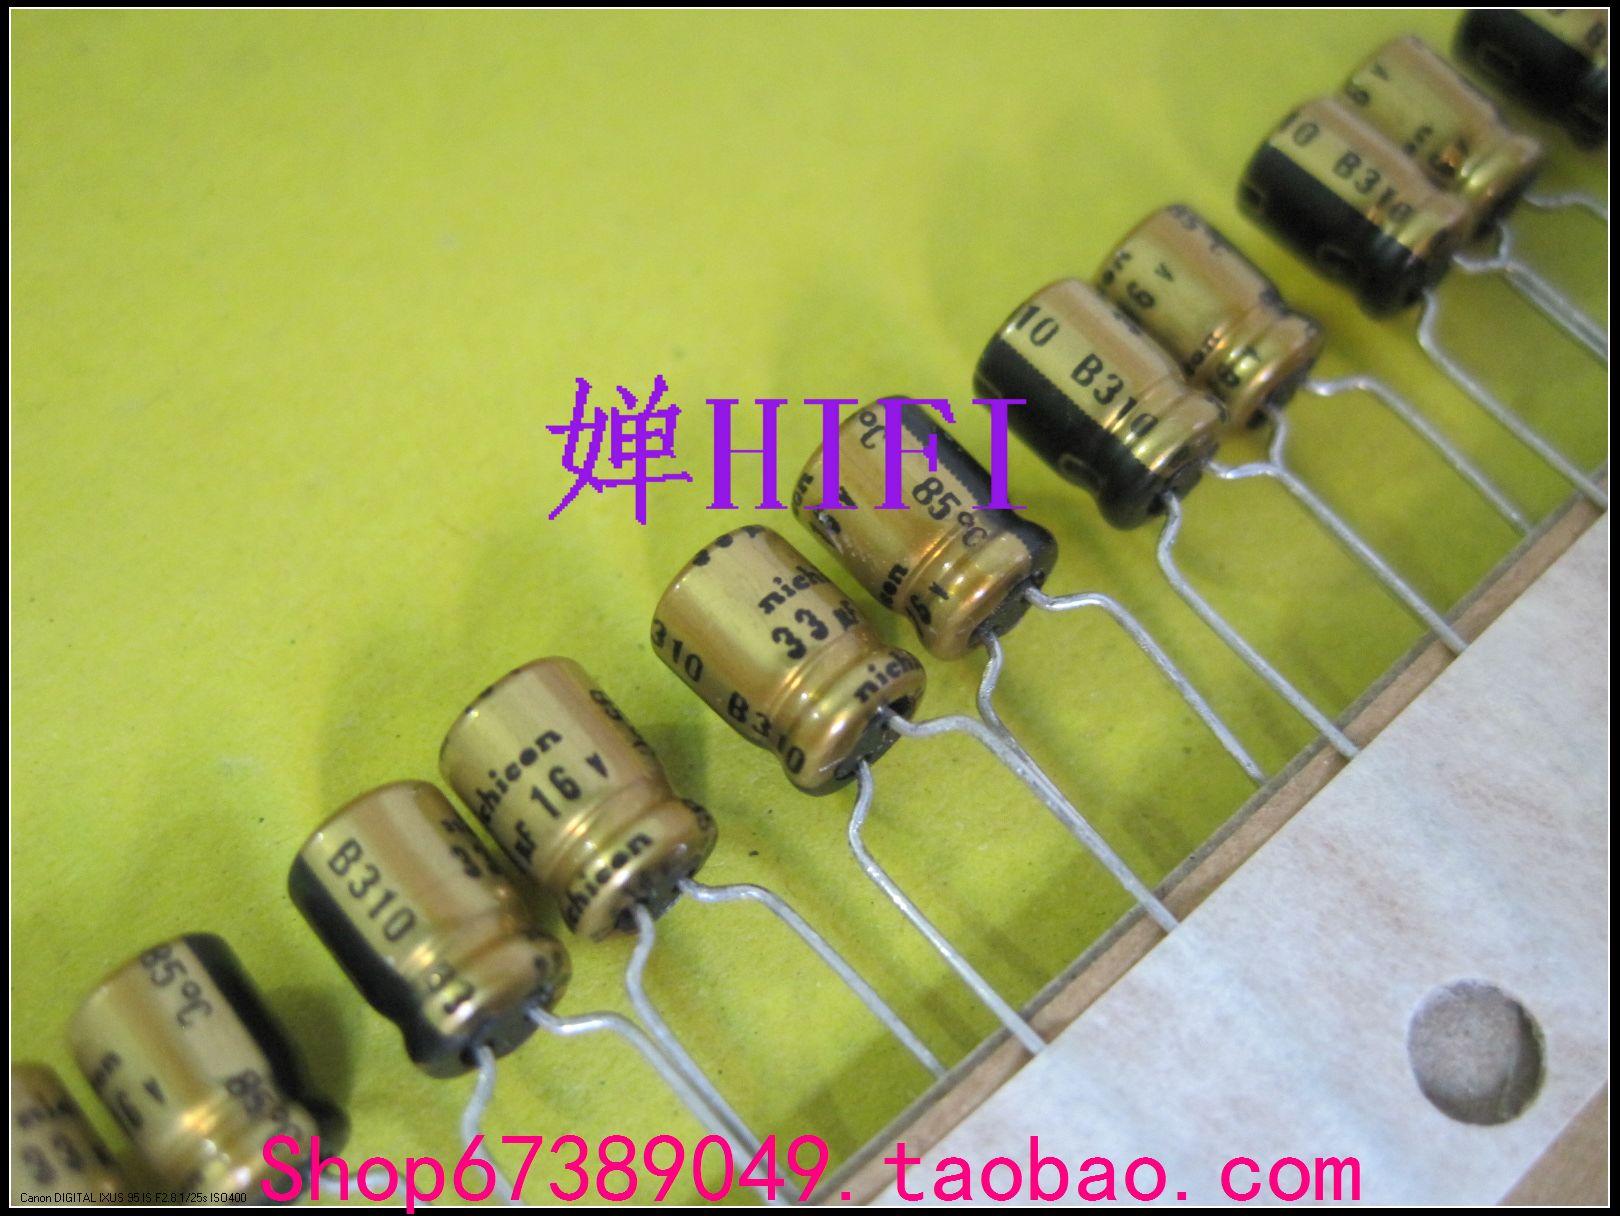 2020 hot sale 20PCS/50PCS Nichicon original Japanese electrolytic capacitor 16v33uf 5x7mm free shipping 2020 hot sale holland bc 20pcs 50pcs 82pf 100v 2